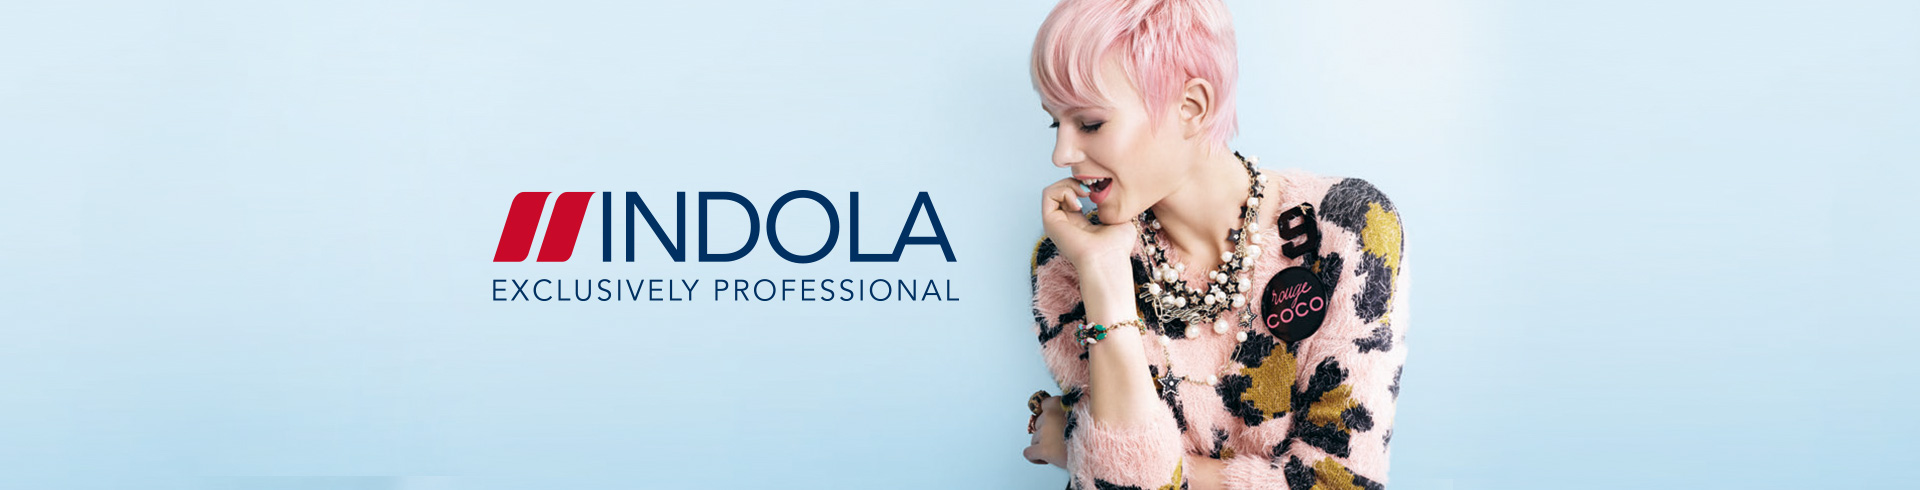 Le Tif Hair and Nails προϊόντα περιποίησης μαλλιών Indola